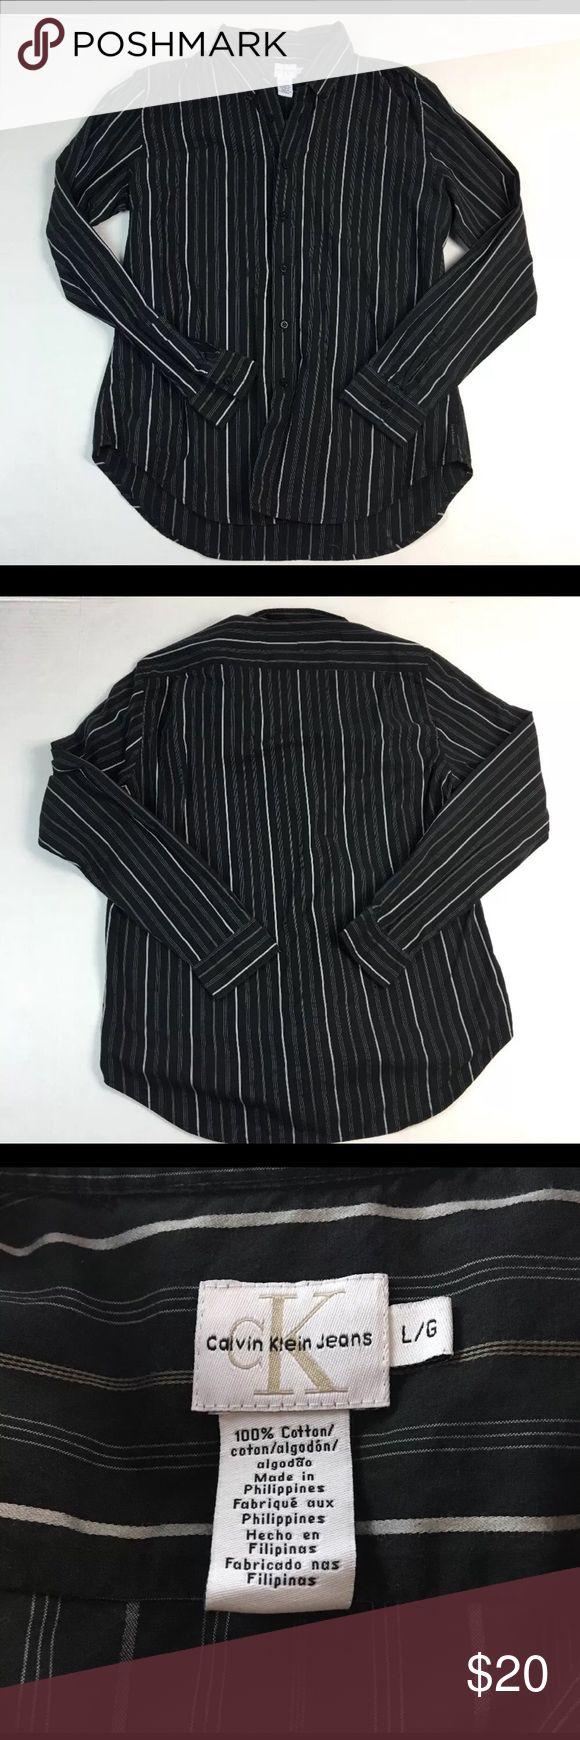 "Calvin Klein Jeans Button Front Shirt Size L/G Brand: Calvin Klein Jeans Size: Large Condition: Gently Worn - No Flaws Material: 100% Cotton Color: Black Neckline To Hemline Measurement: 31.5"" Chest Measurement (Pit to Pit): 21.5"" Sleeve: 25.75 Care: Machine Washable Extra Information:  Button Front; Button Down Collar; Single Button Cuff     Calvin Klein Jeans Shirts"